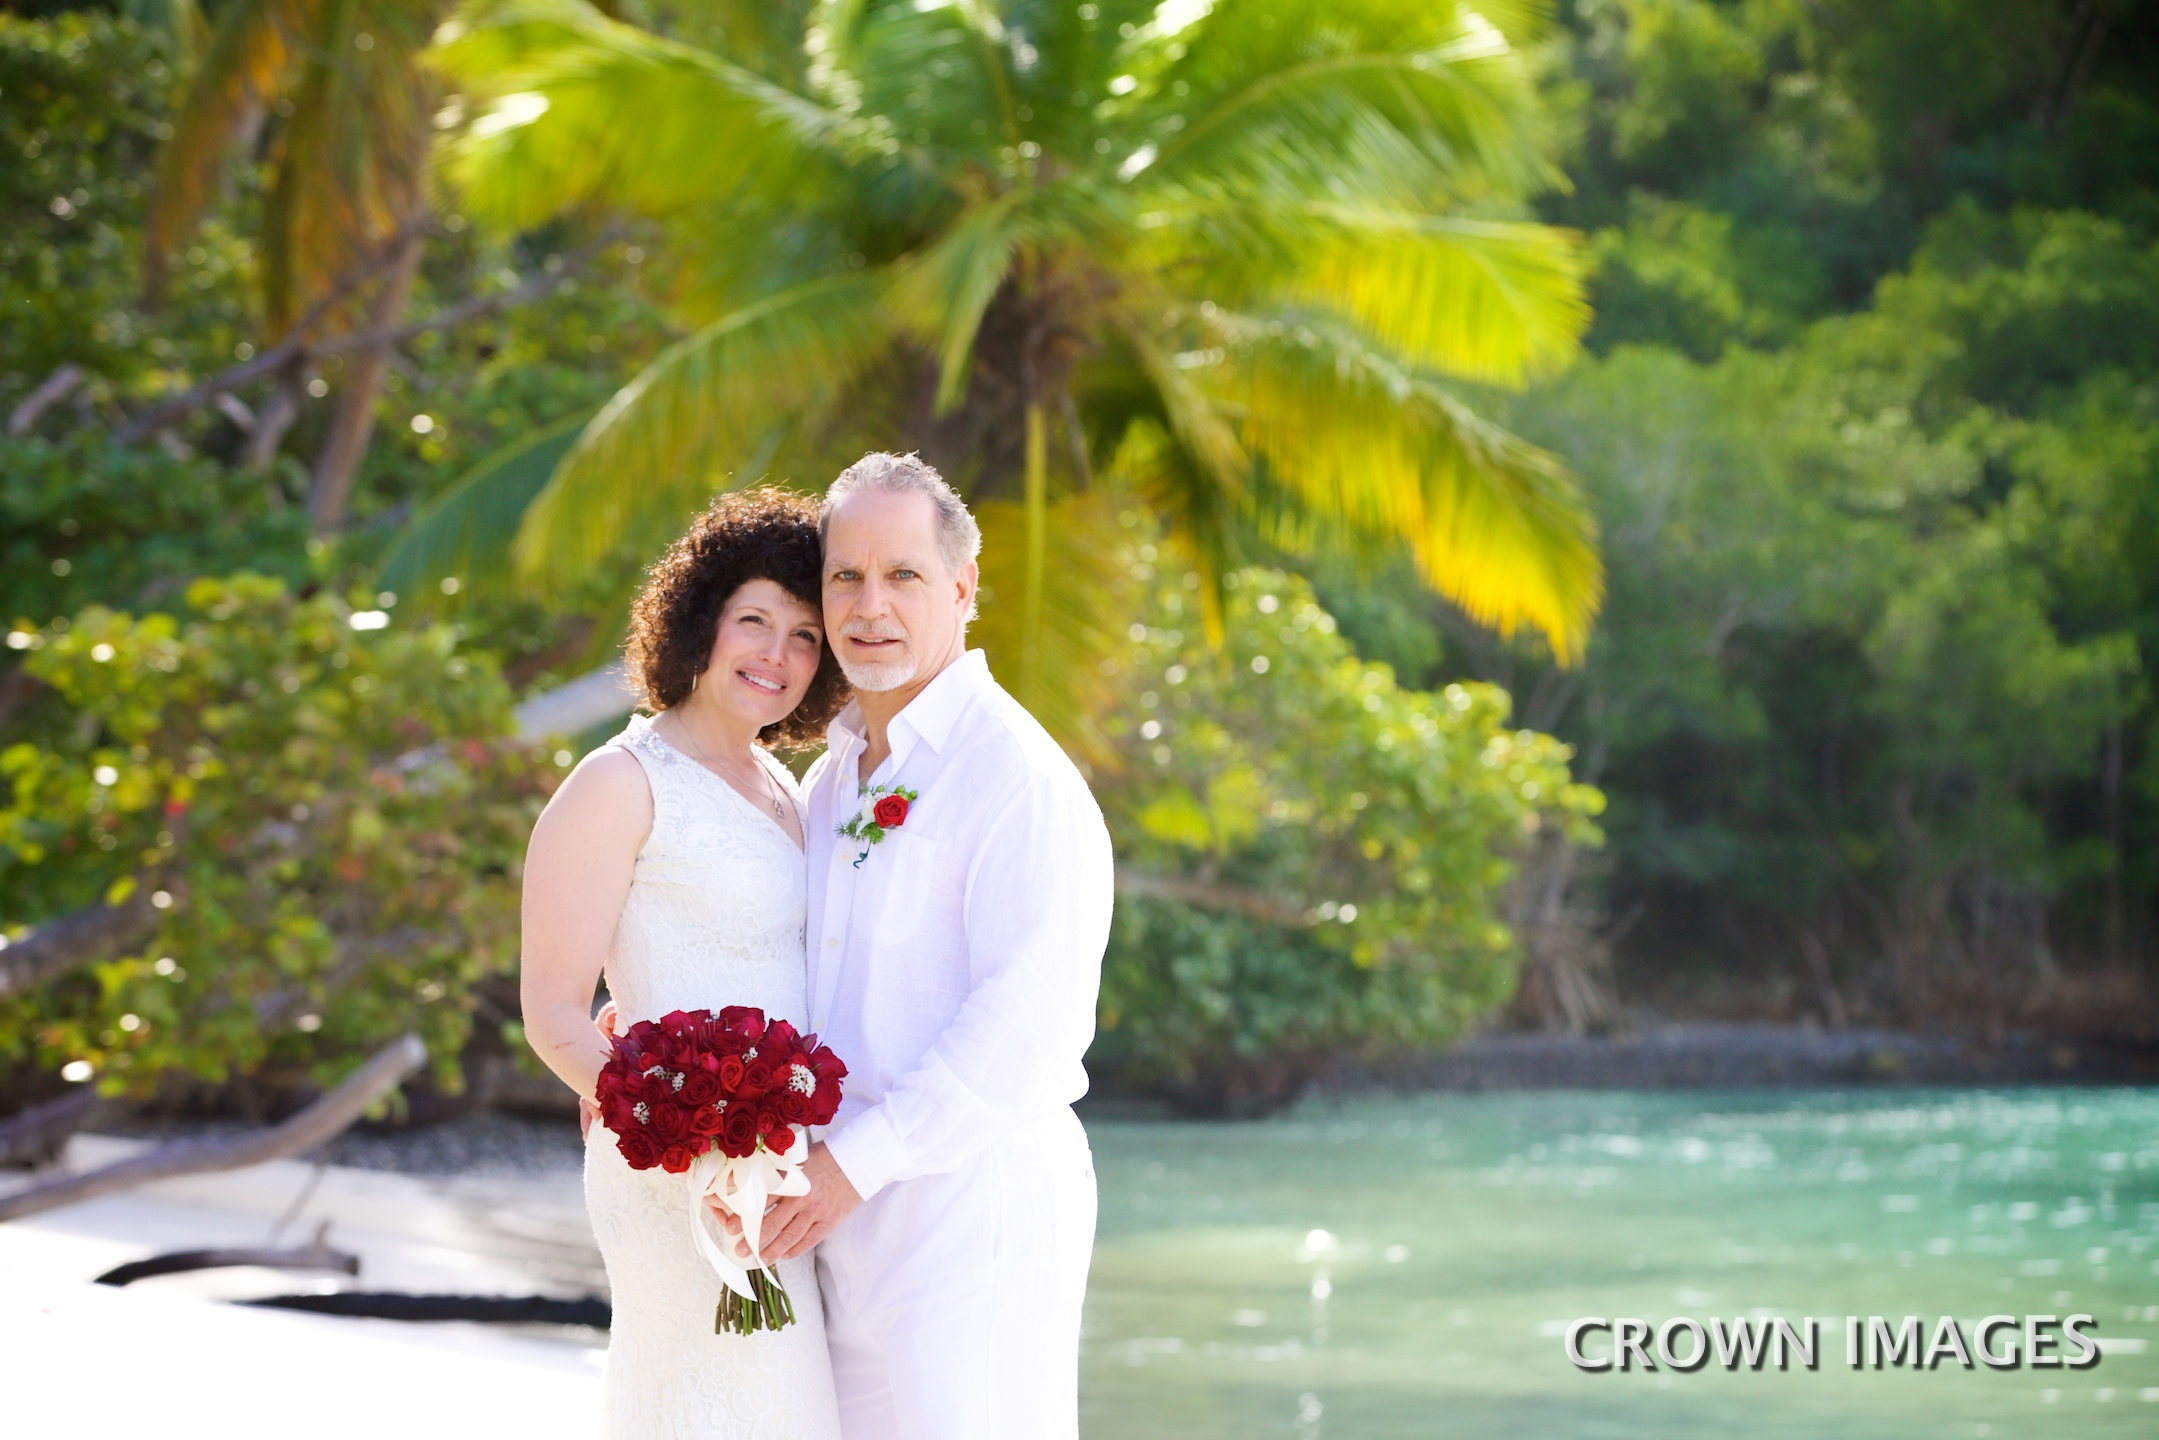 virgin island wedding IMG_4968.jpg